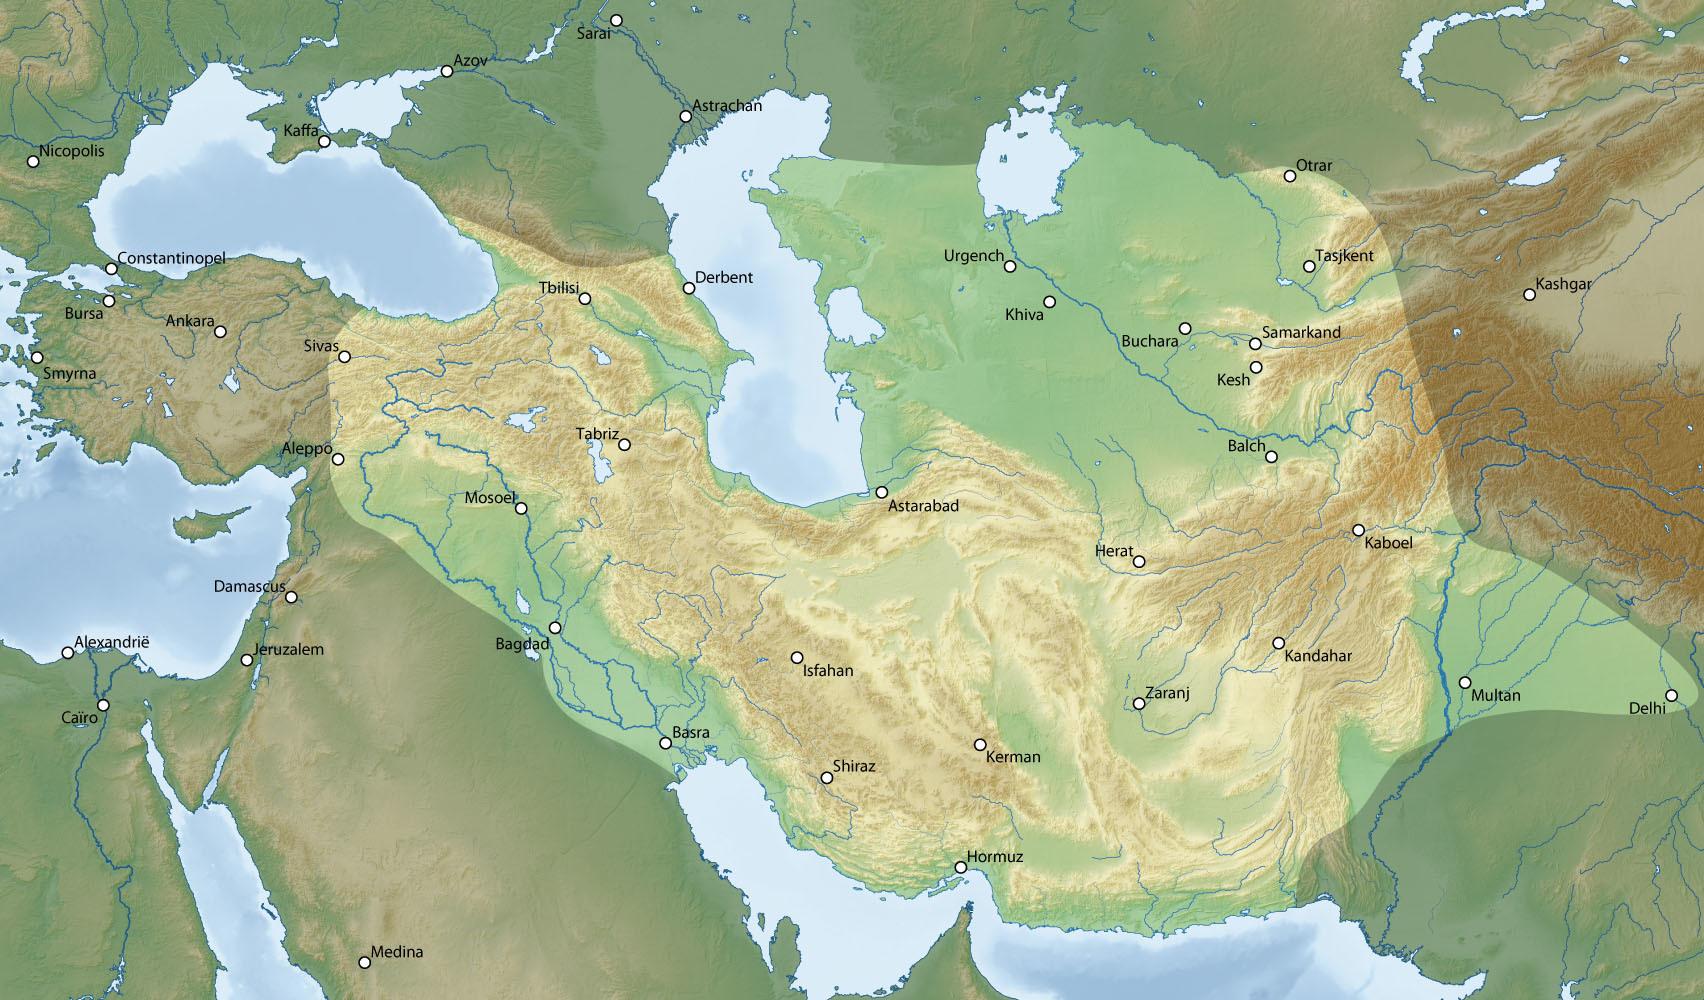 Timur_Empire.jpg